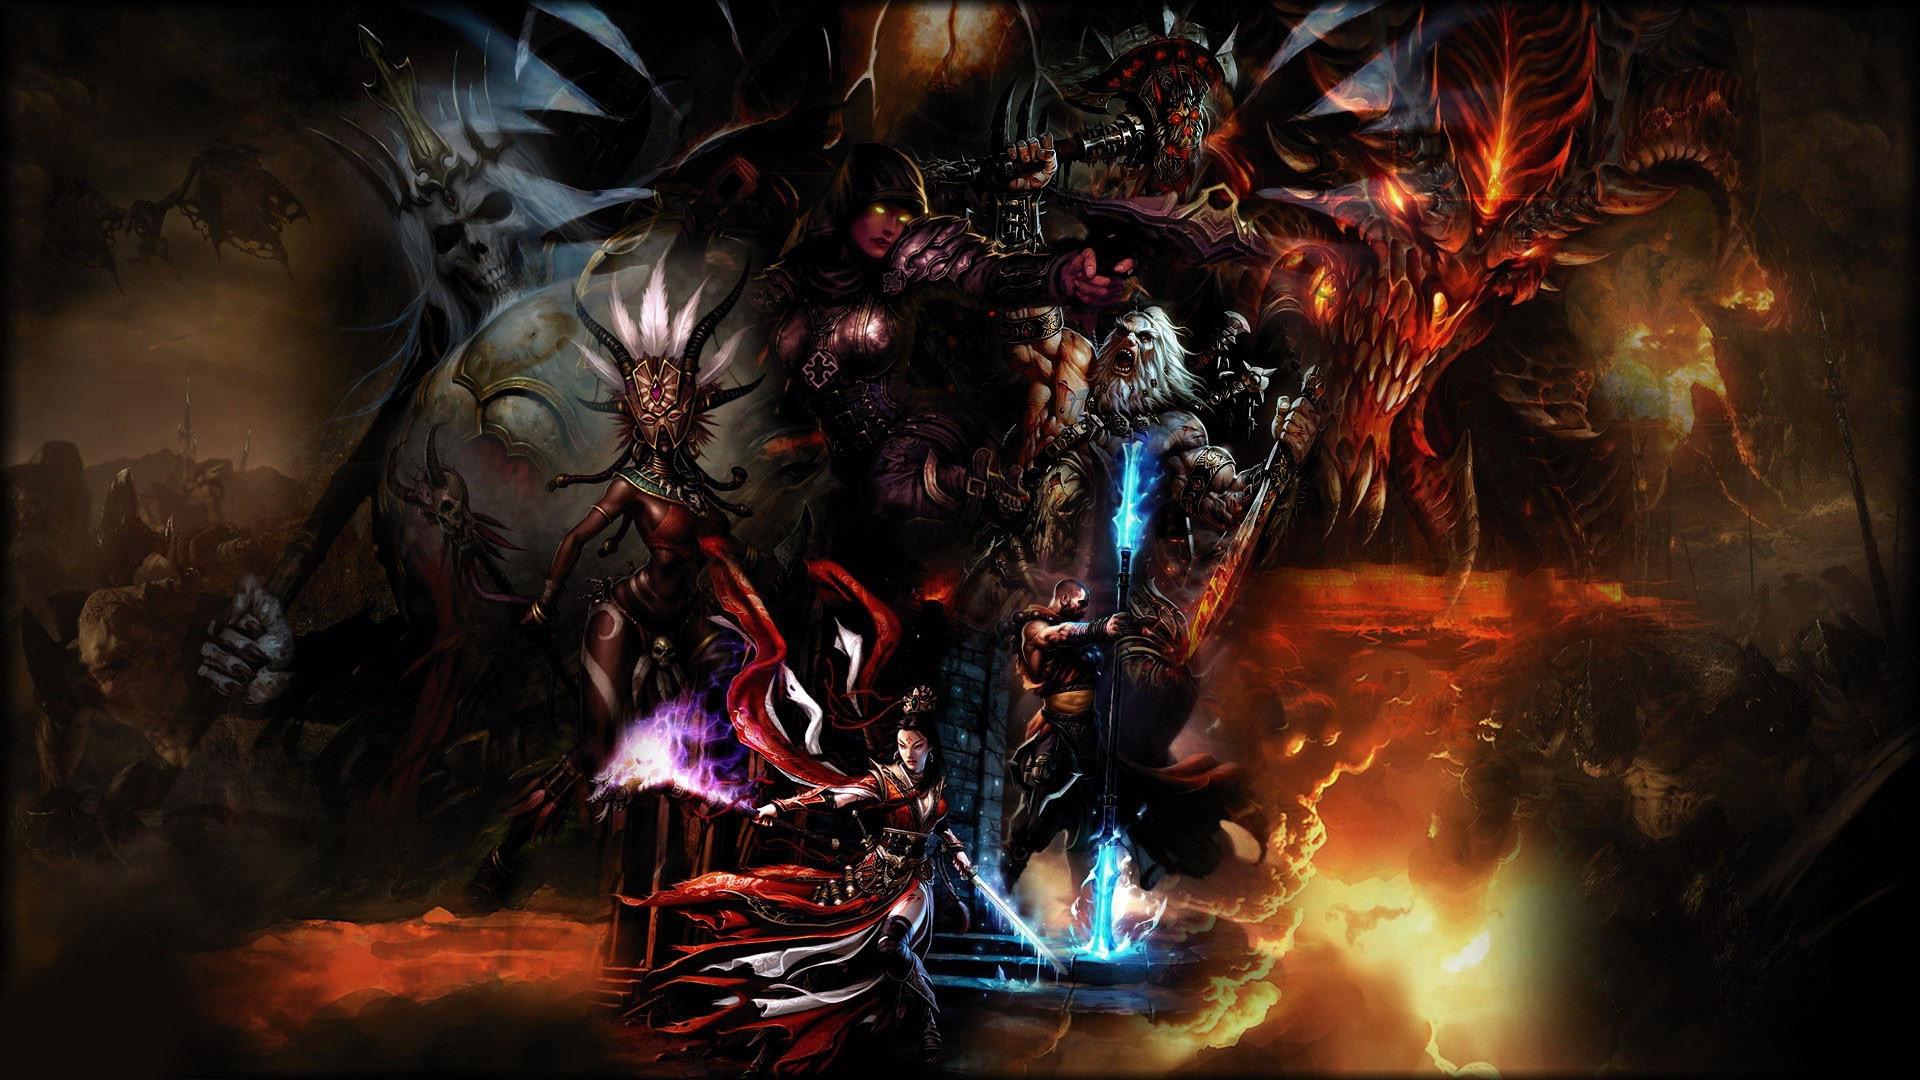 Free Download Wallpaper Diablo 3 Hd Gratuit Tlcharger Sur Ngn Mag